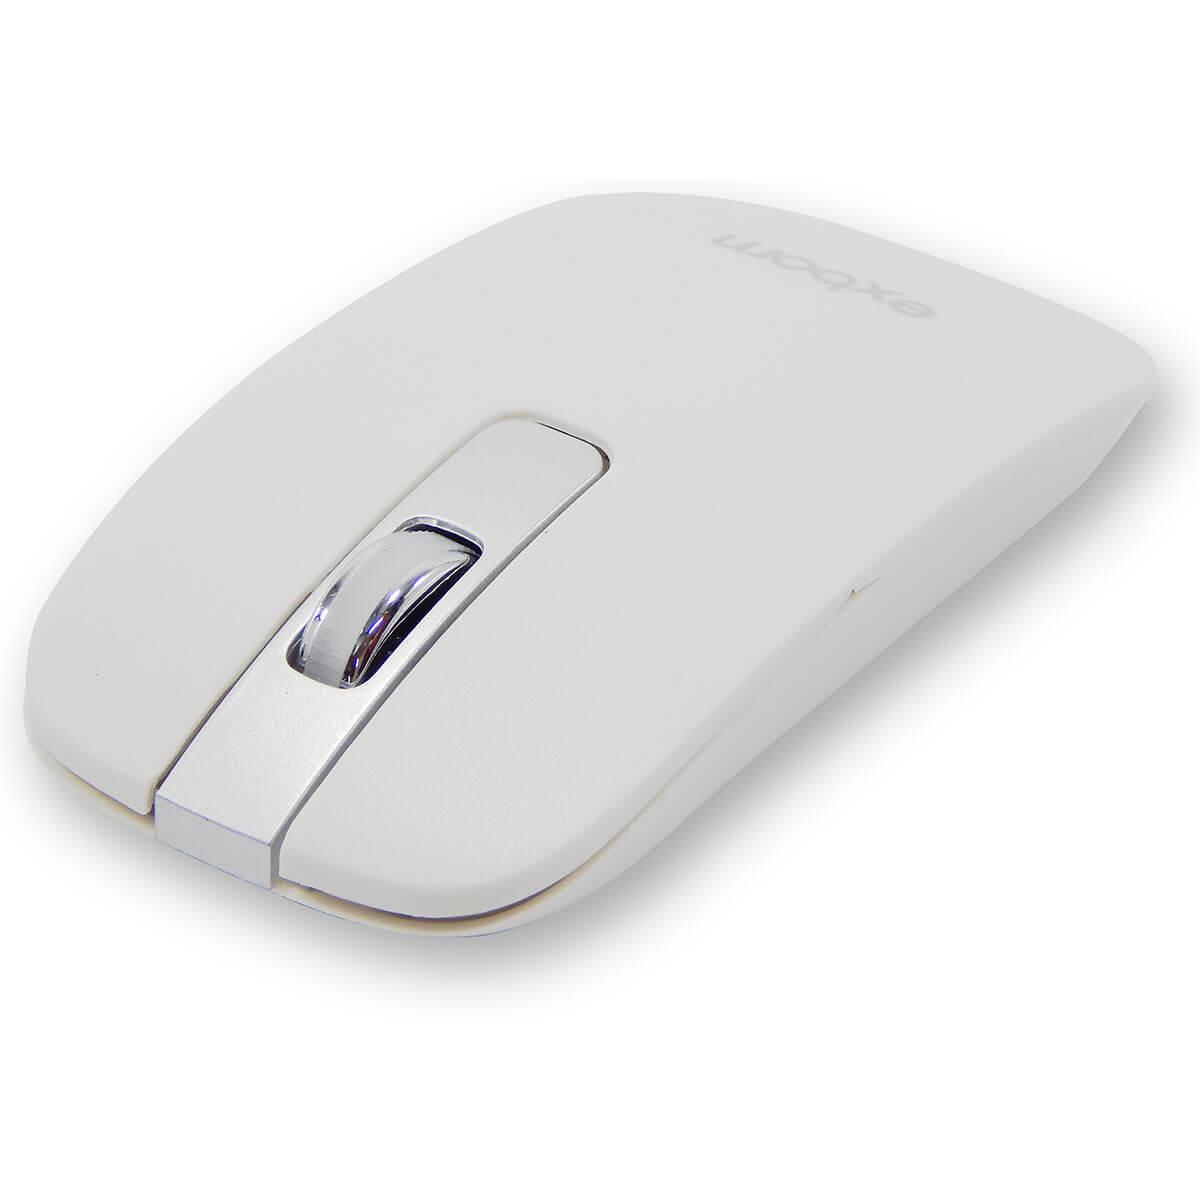 Kit Teclado e Mouse Sem Fio Exbom BK-S1000